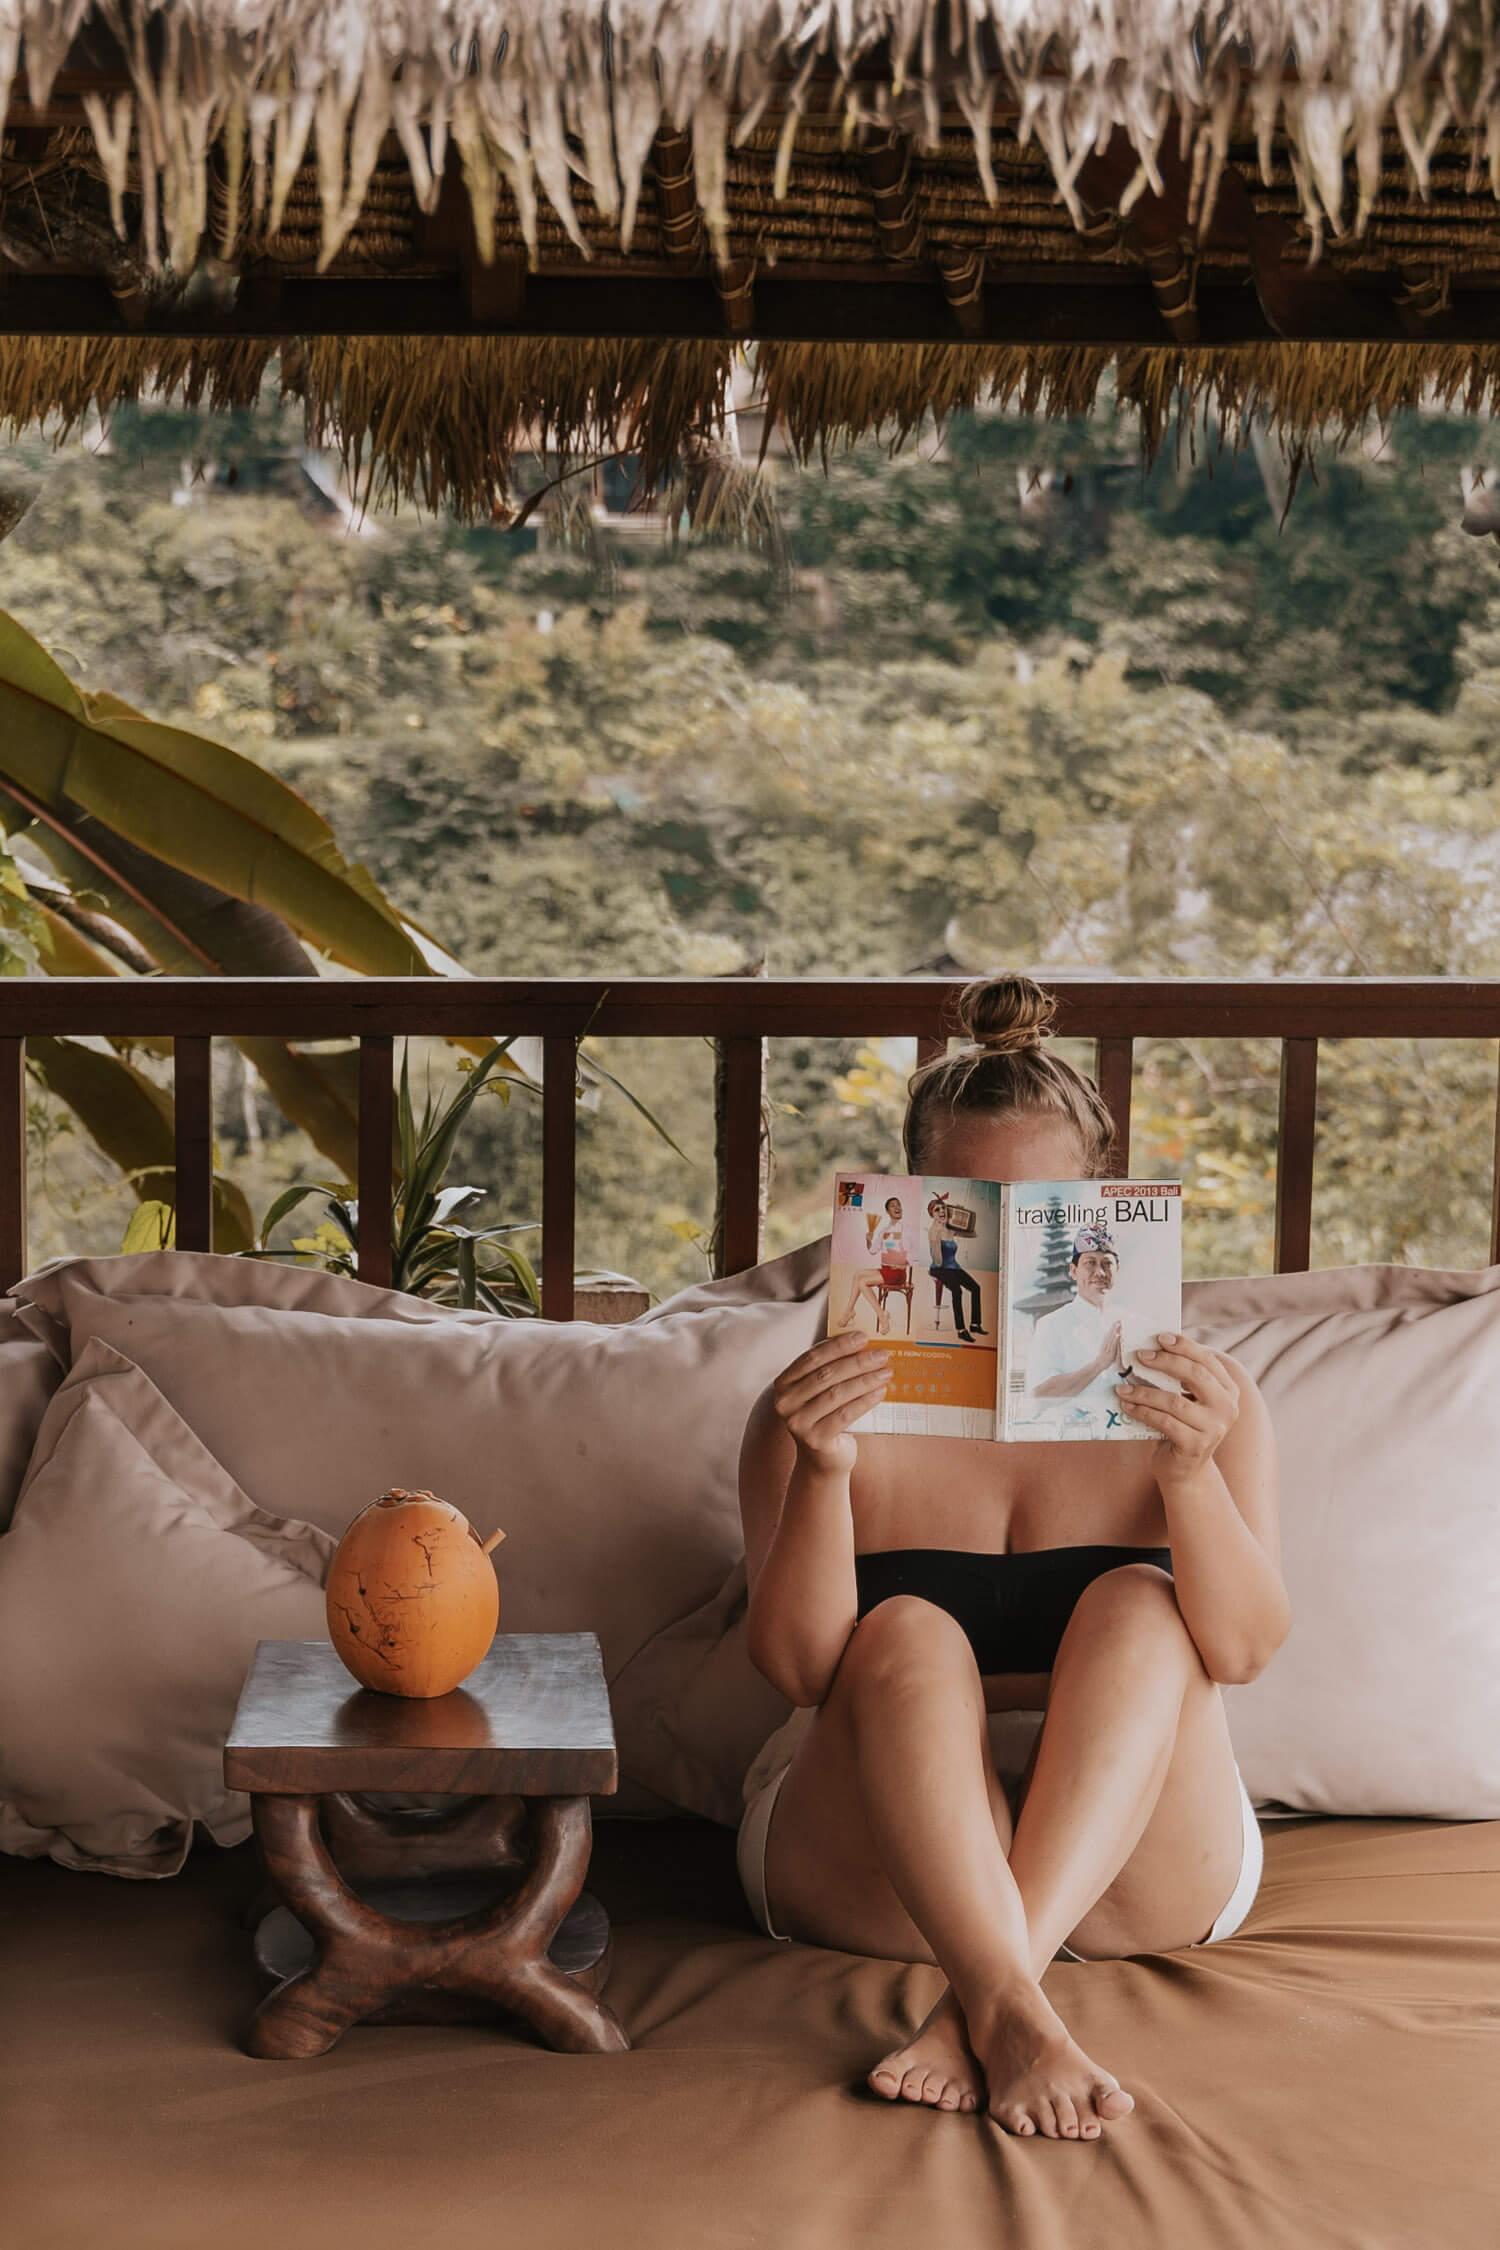 Villa Cella Bella Ubud Bali Most instagrammable hotels in bali